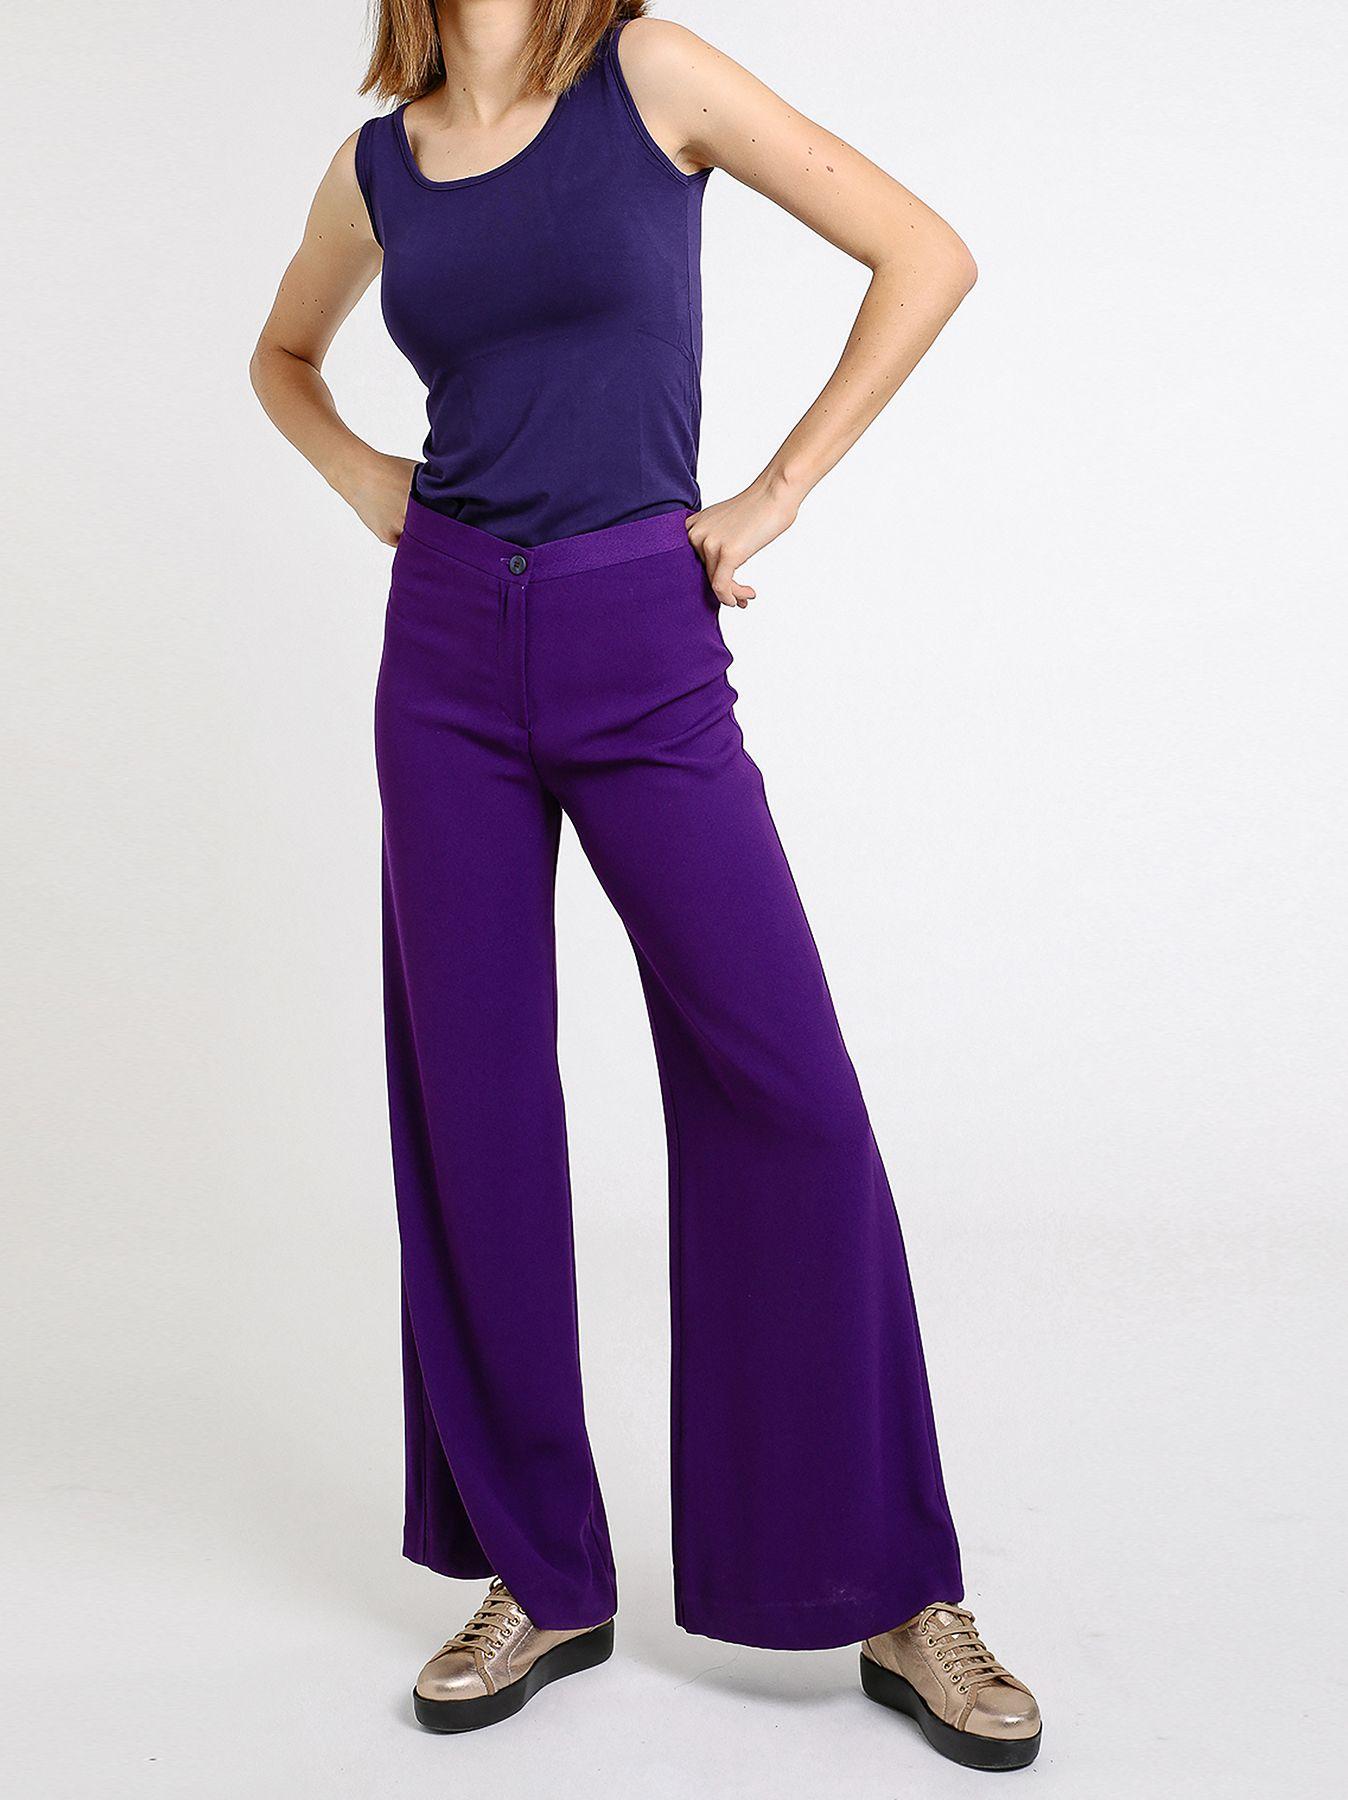 Pantalone a zampa '70 in cady